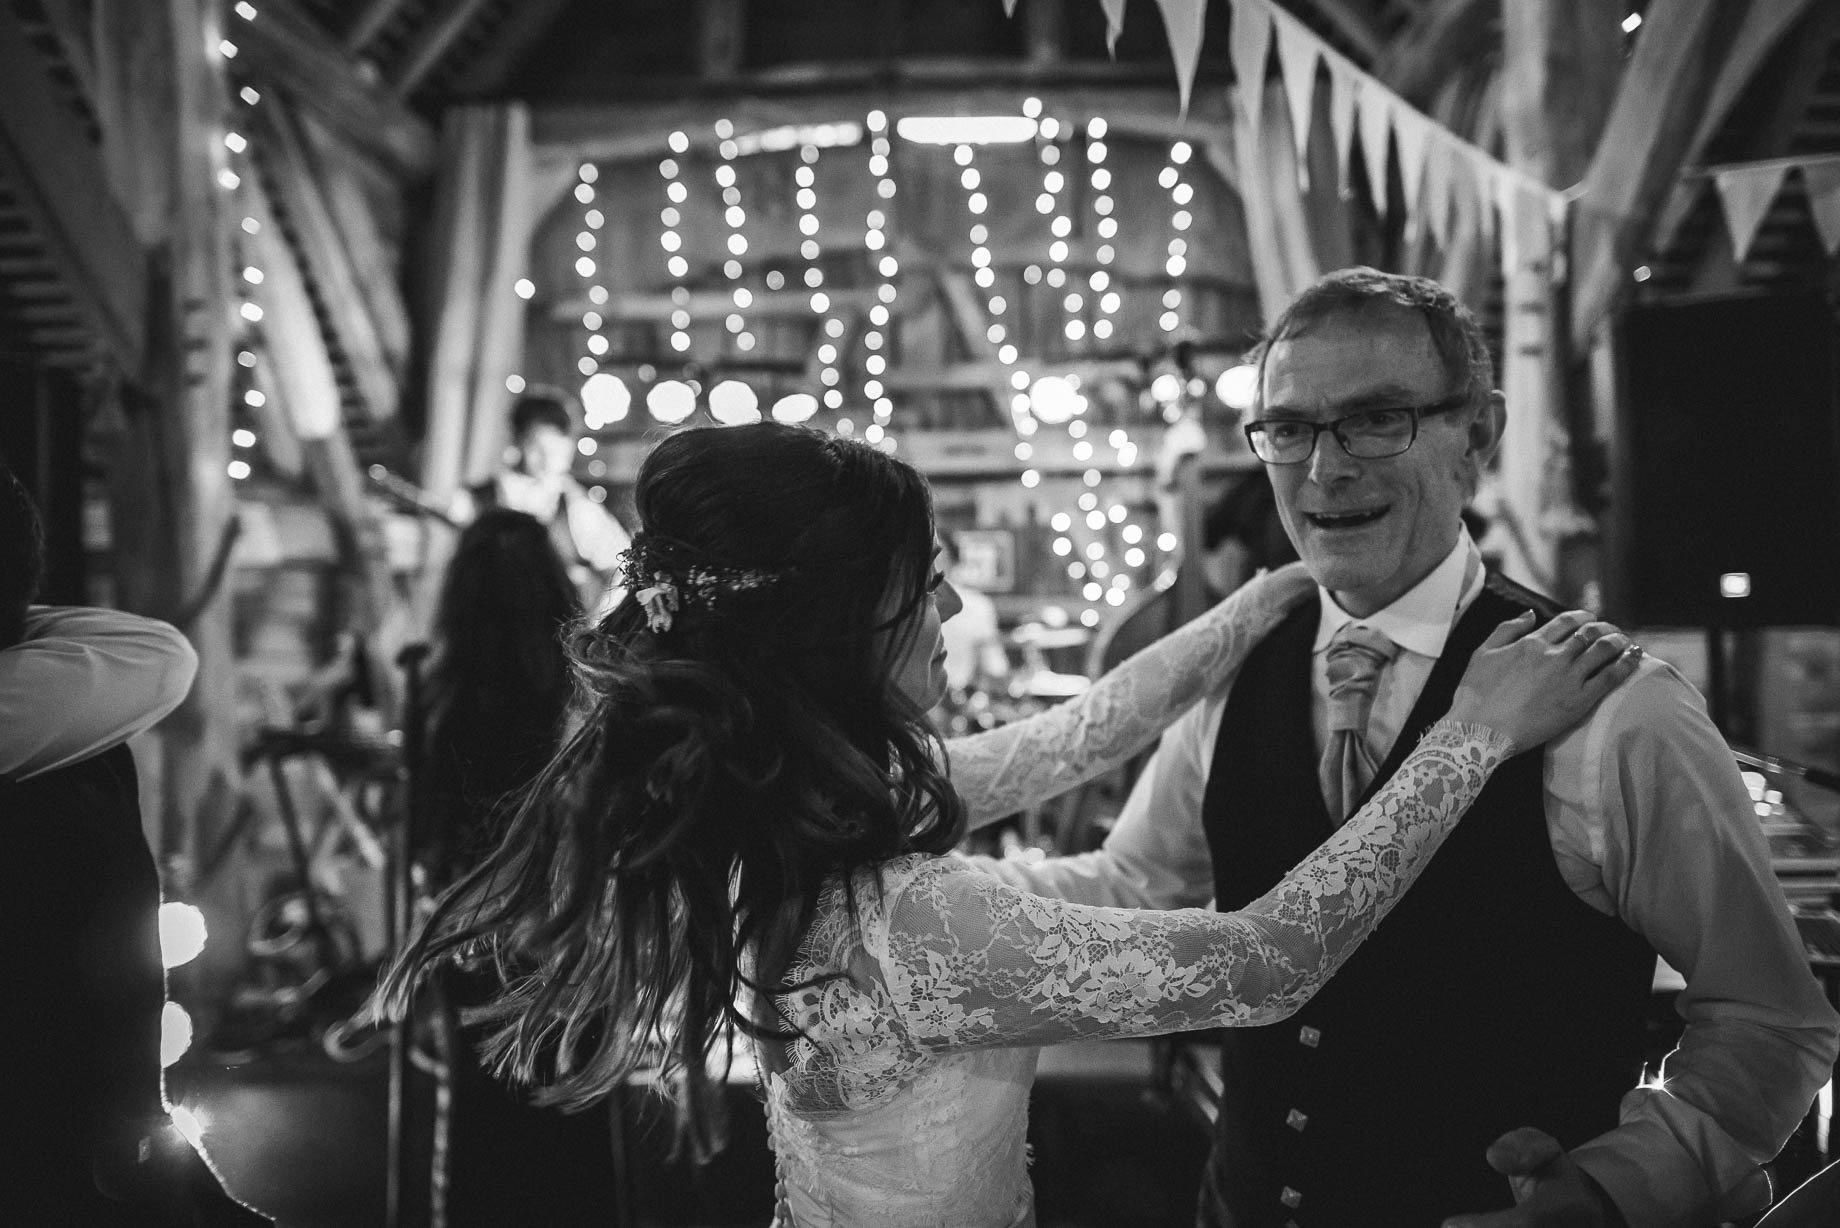 Gildings Barn wedding photography - Sarah and Steve (190 of 190)